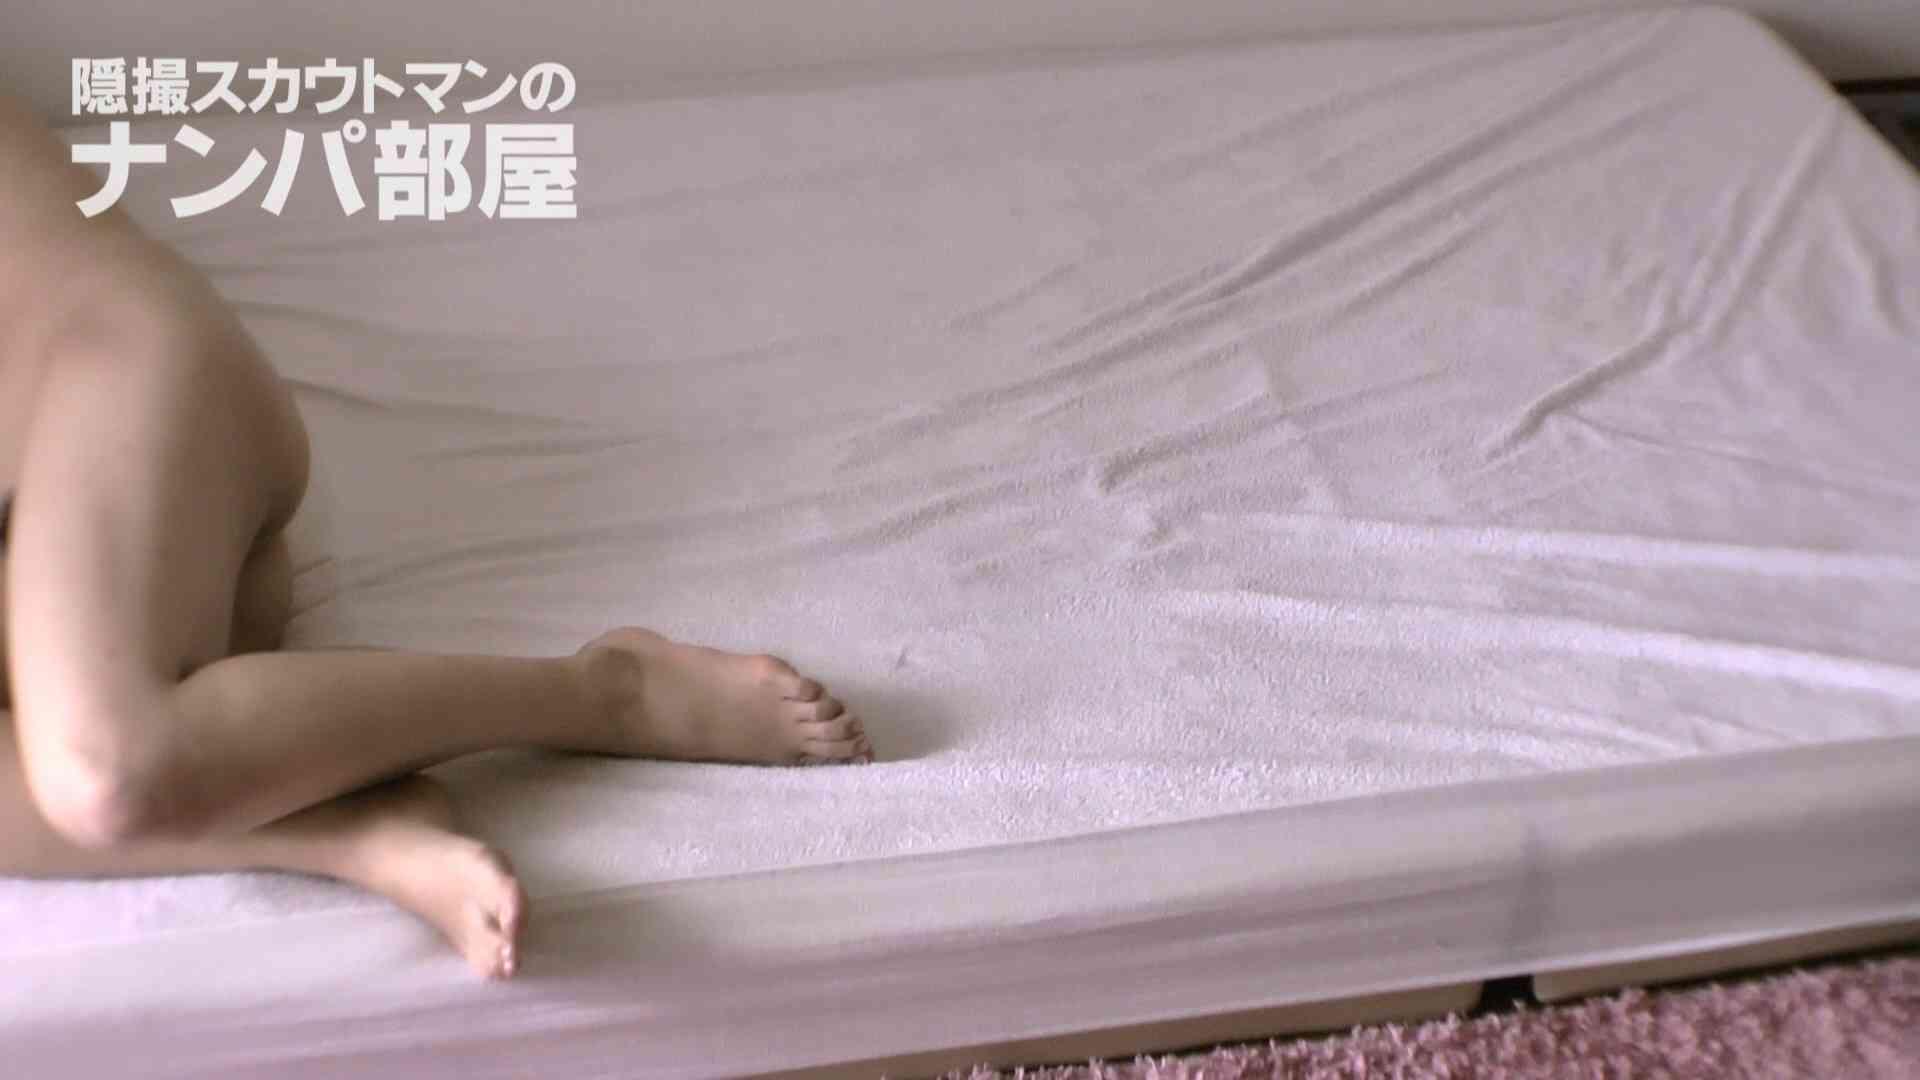 vol.2 sii 脱衣所・着替え編   ナンパ  95pic 82